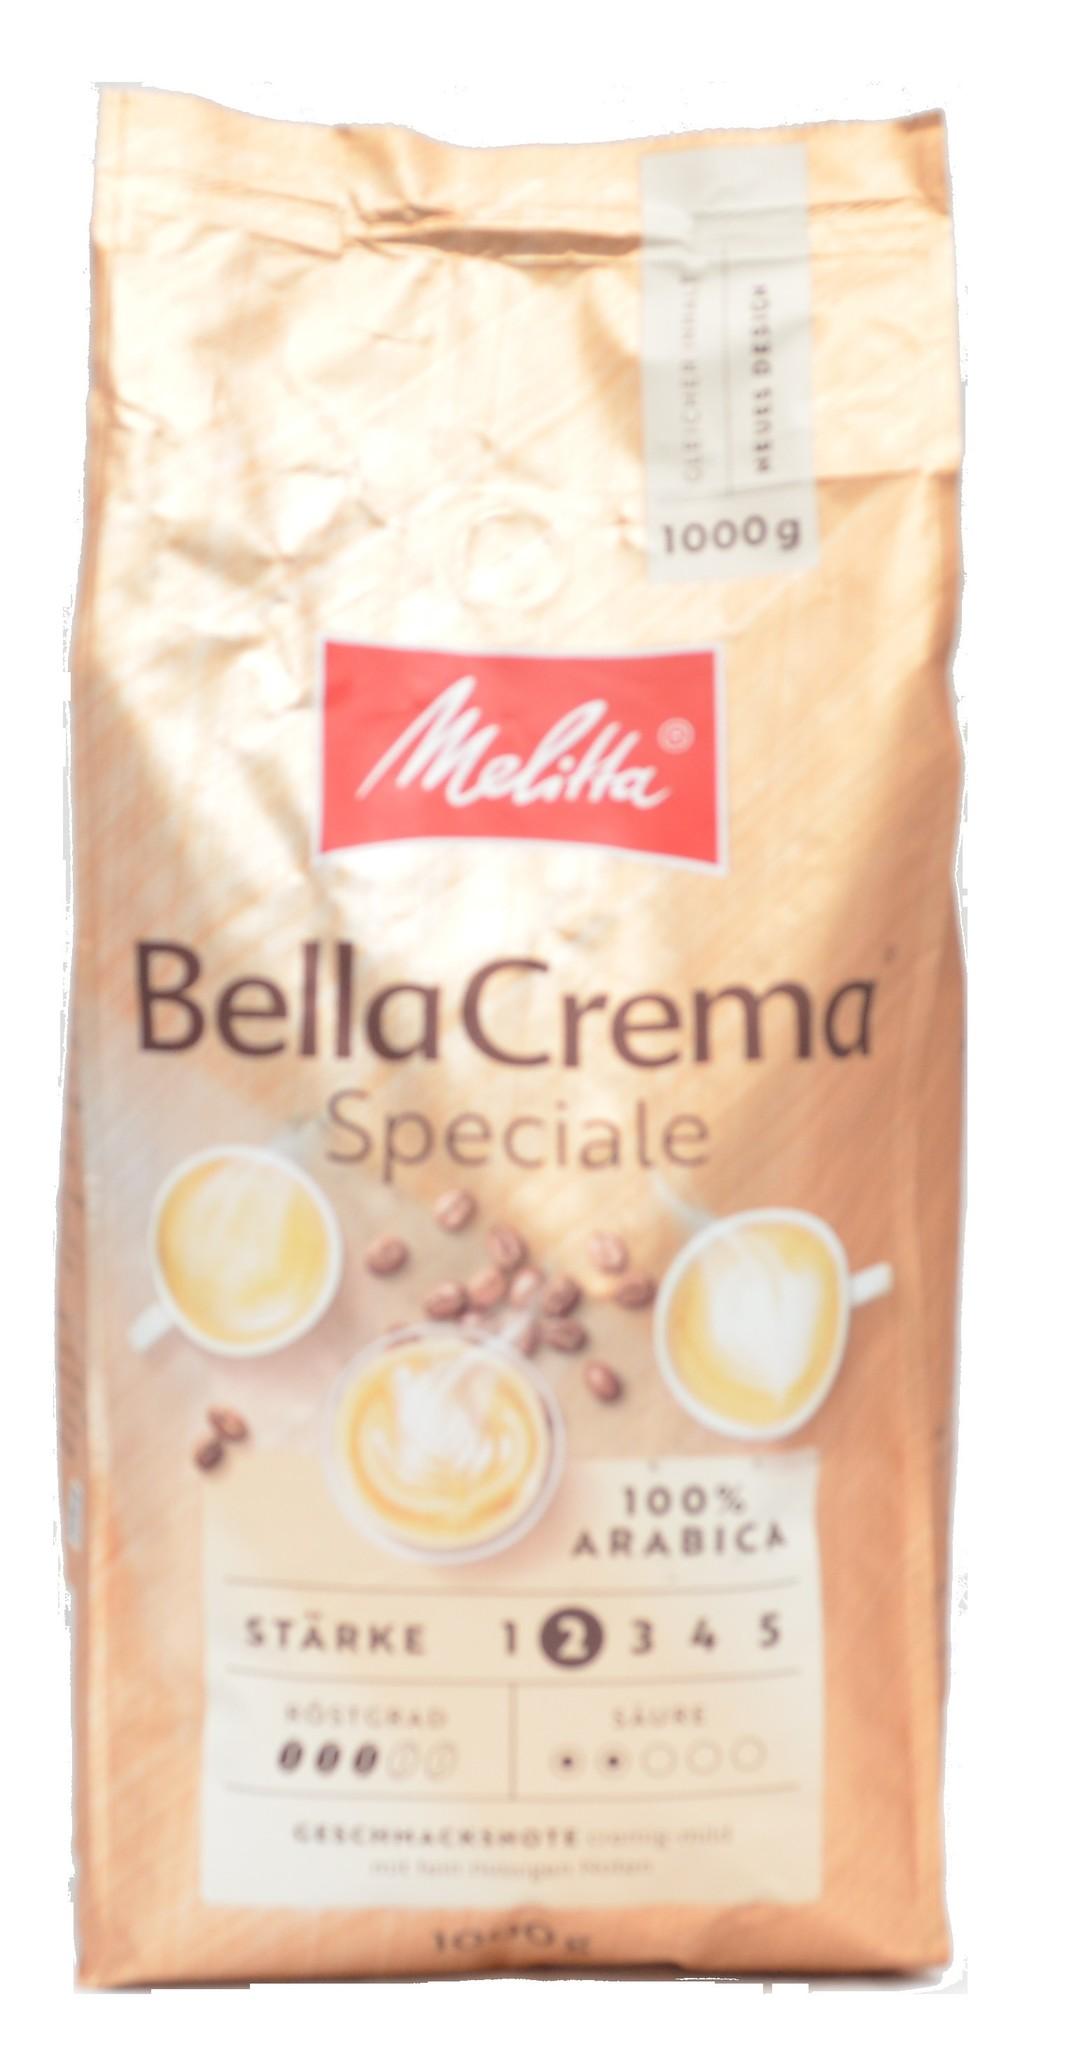 Melitta Bellacrema speciale bonen 1 kg vanaf € 8.27